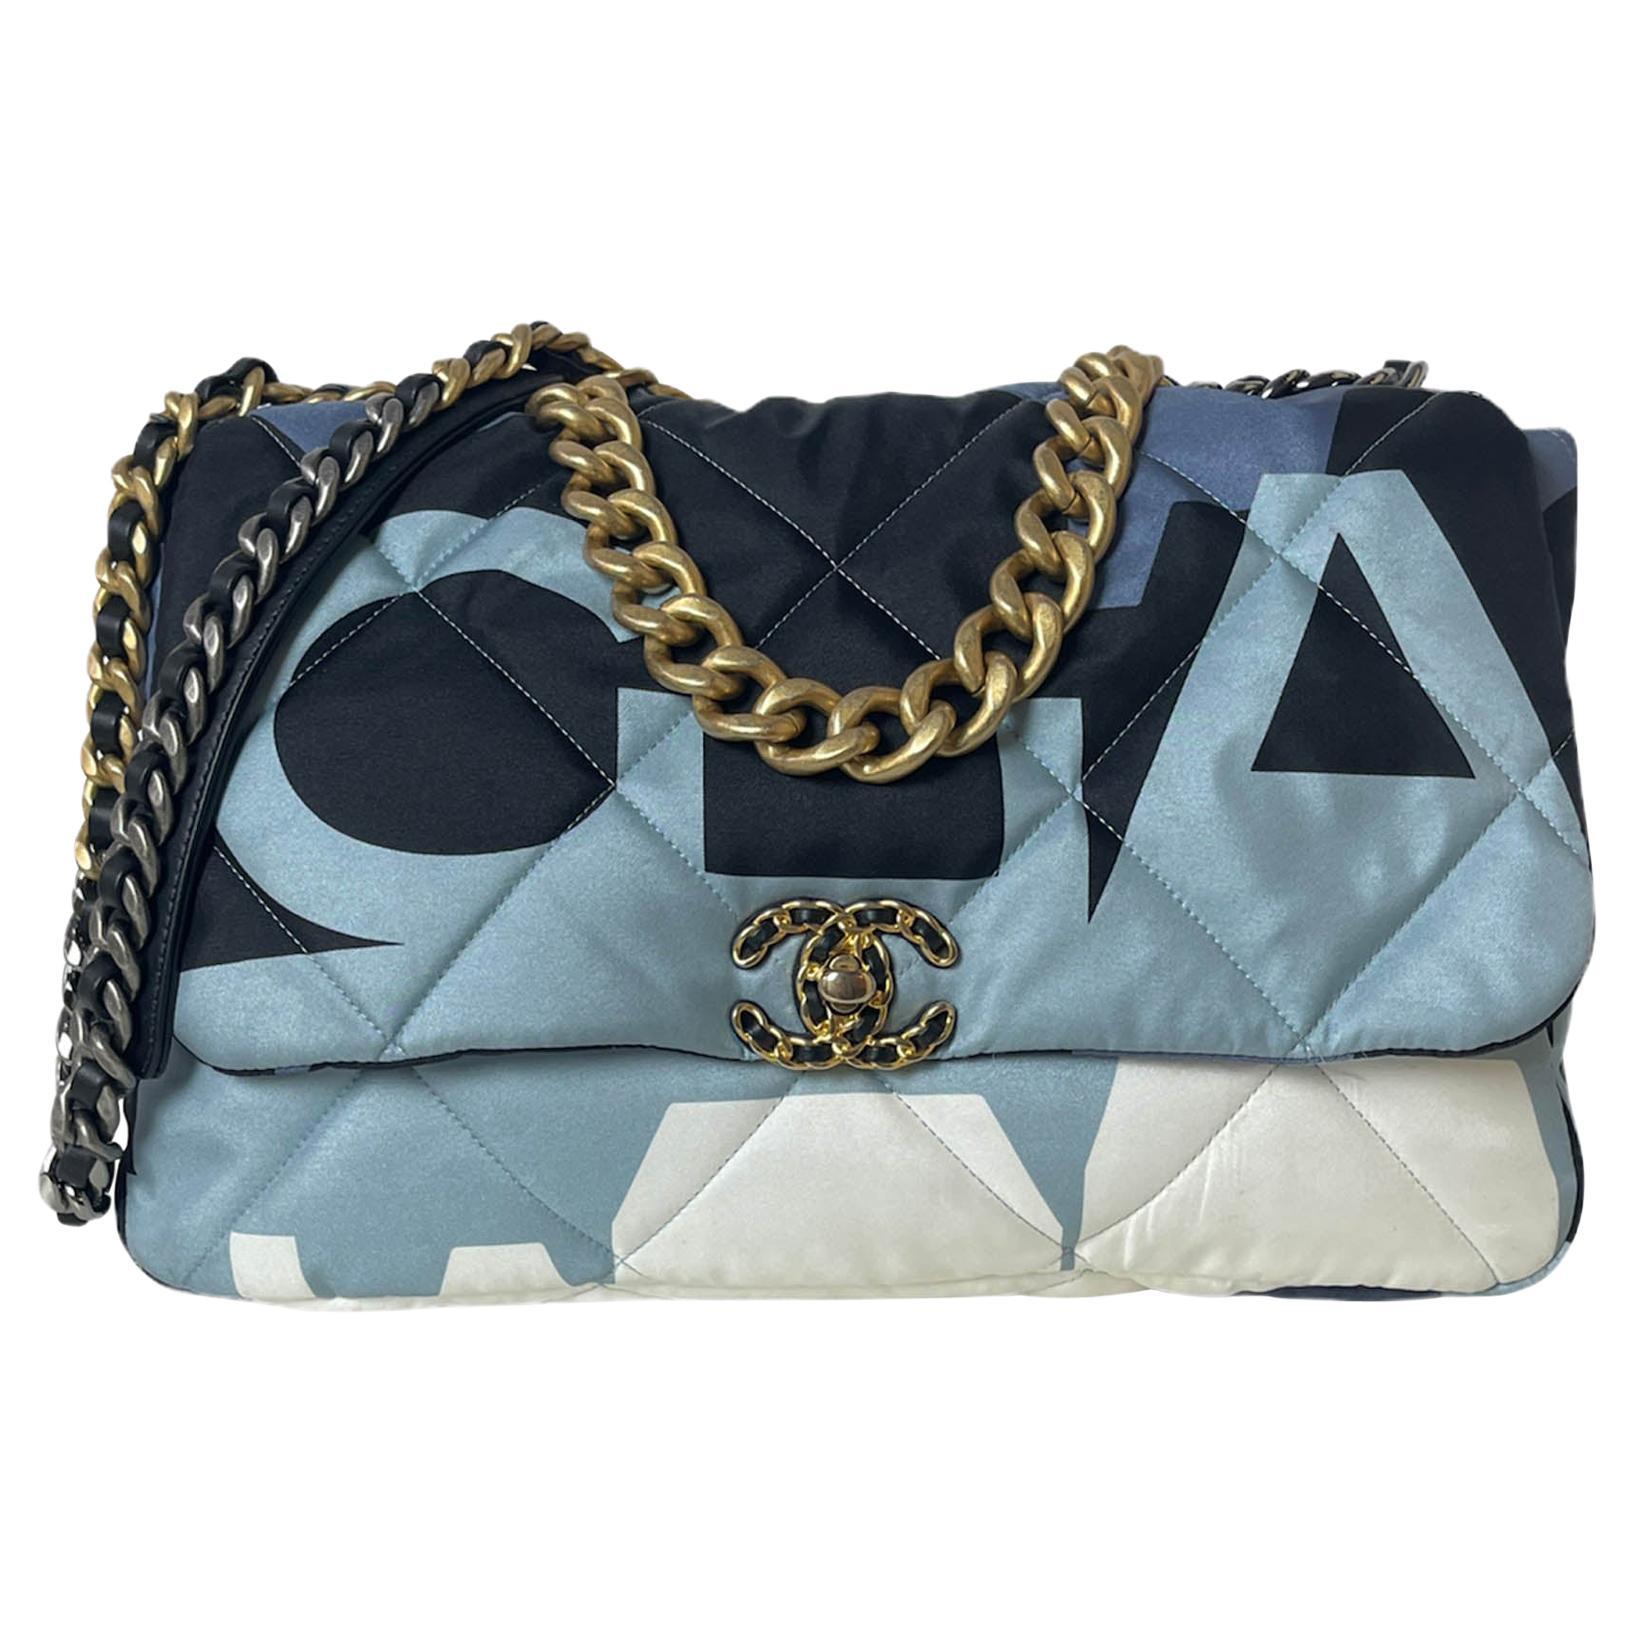 Chanel 2020 Blue/White/Black Nylon Maxi Scarf Chanel 19 Flap Bag